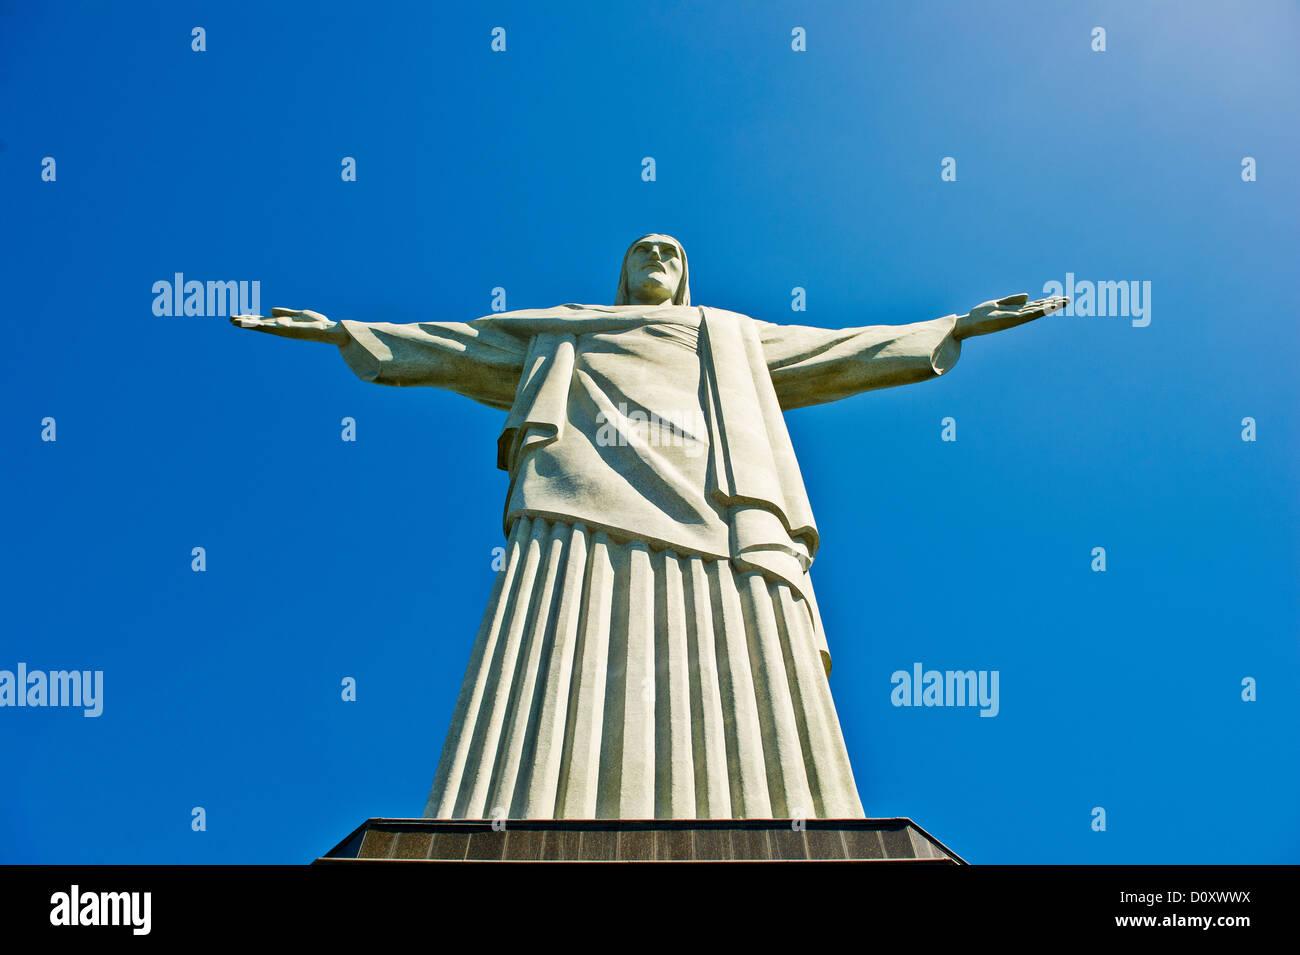 La estatua de Cristo Redentor, Río de Janeiro, Brasil Imagen De Stock